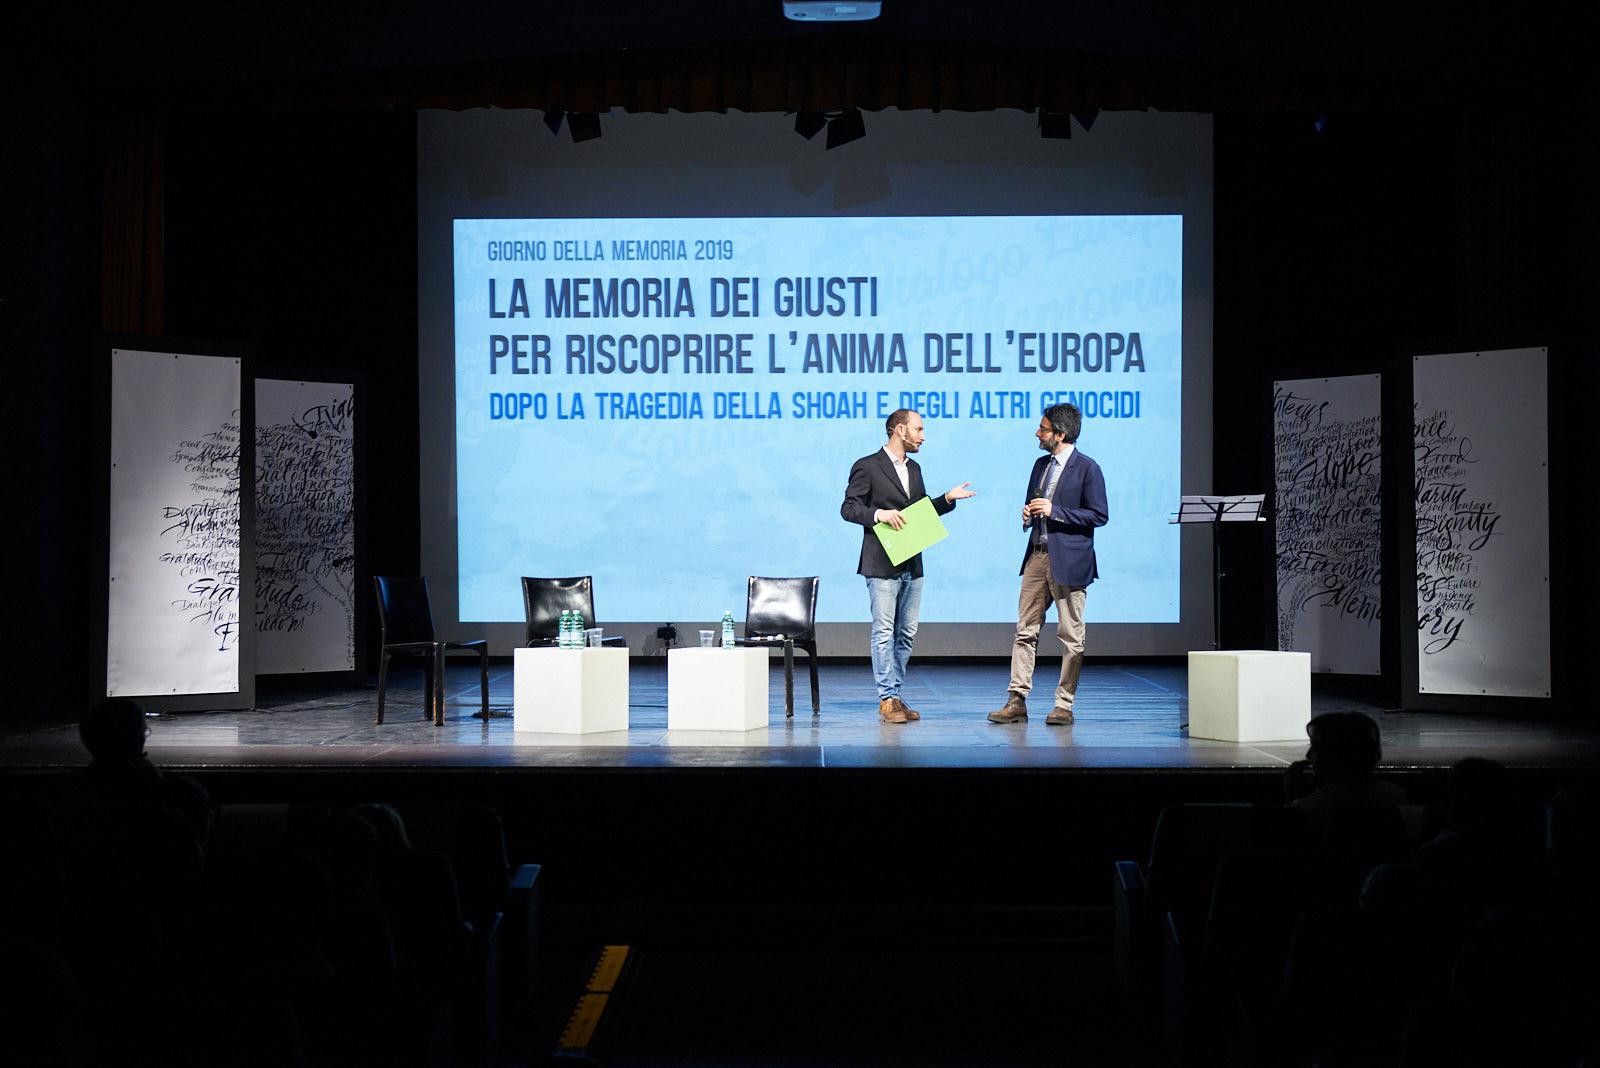 the presenter Enrico Pittaluga and Lamberto Bertolé, president of the City Council of Milan